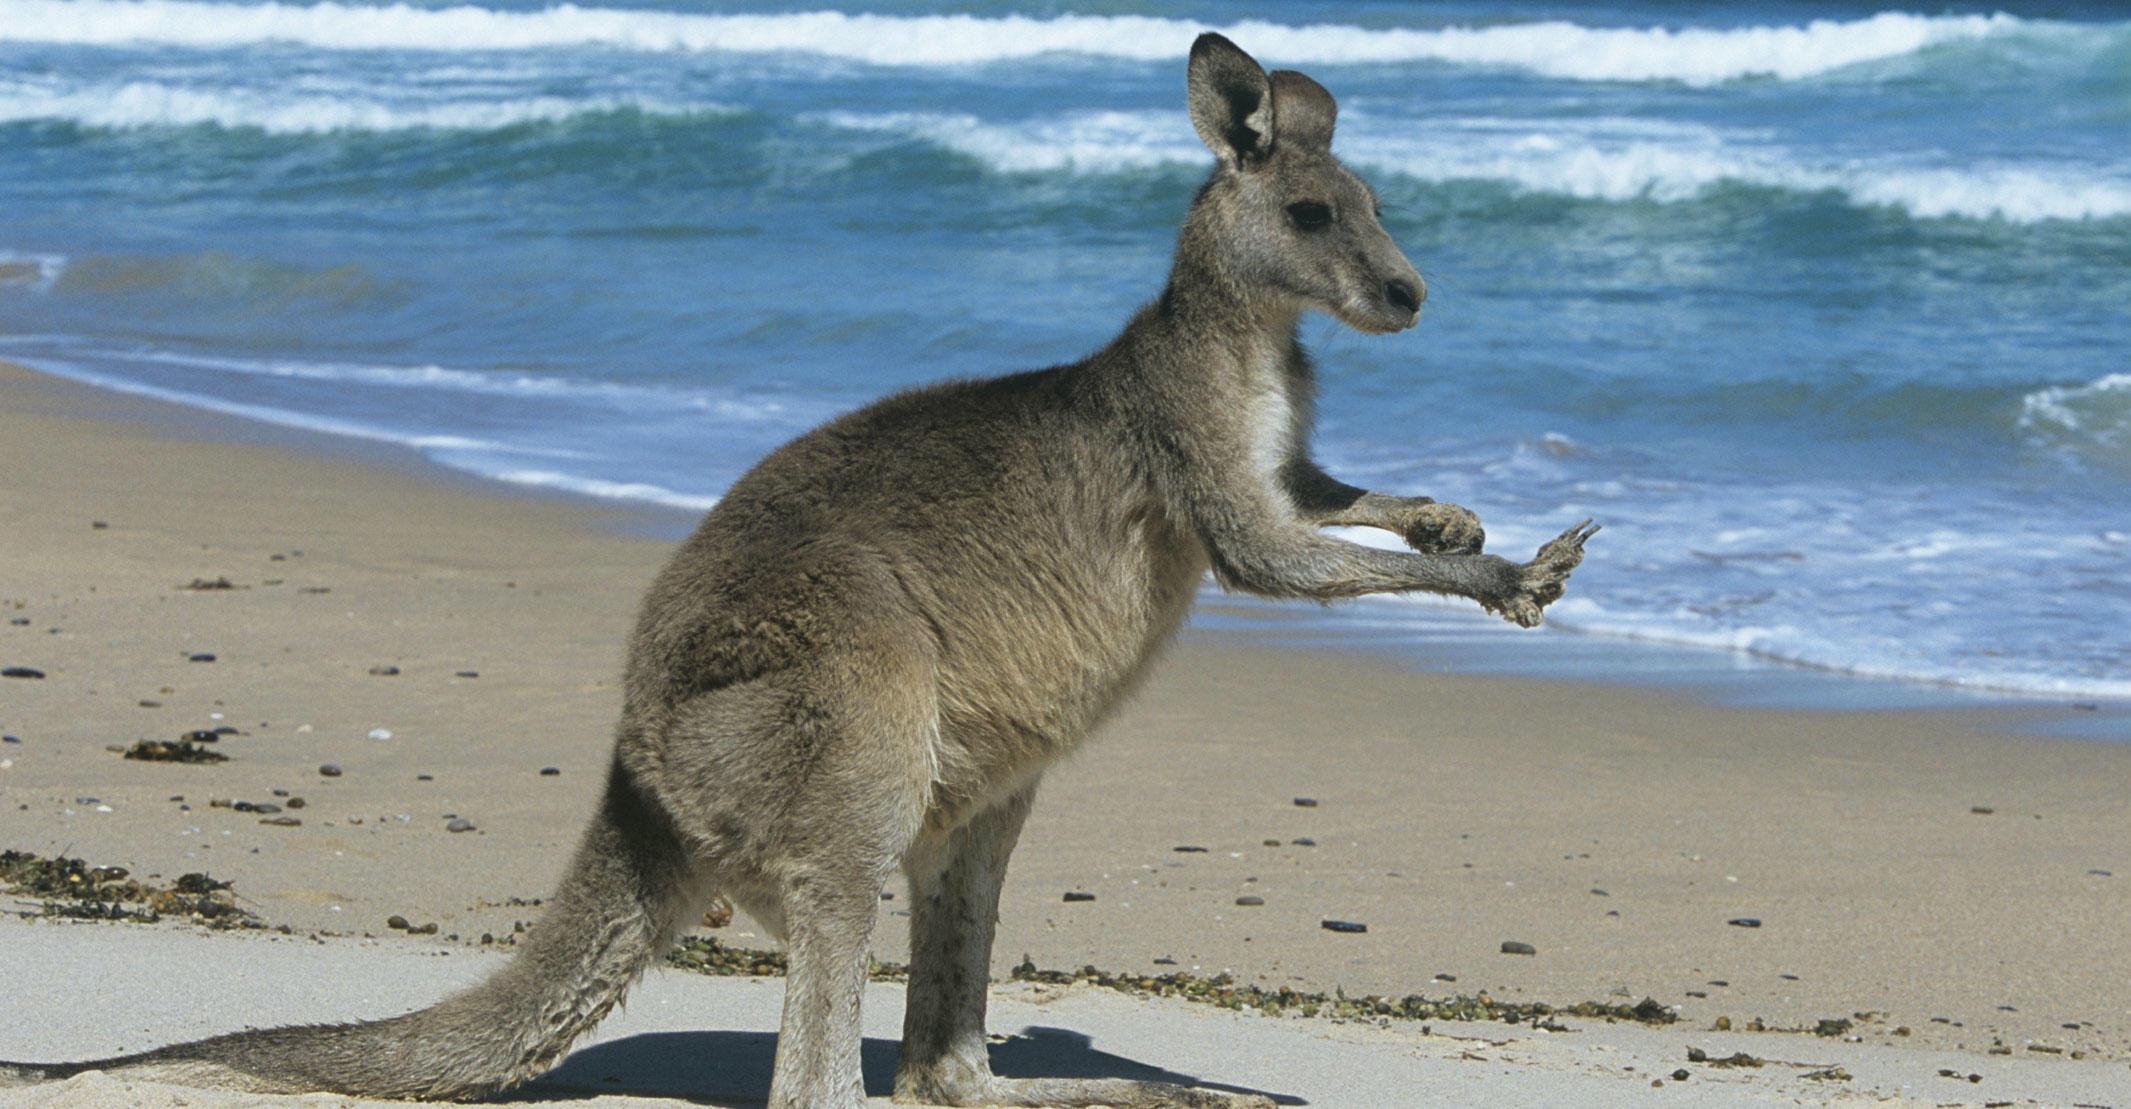 Kangaroo with hands